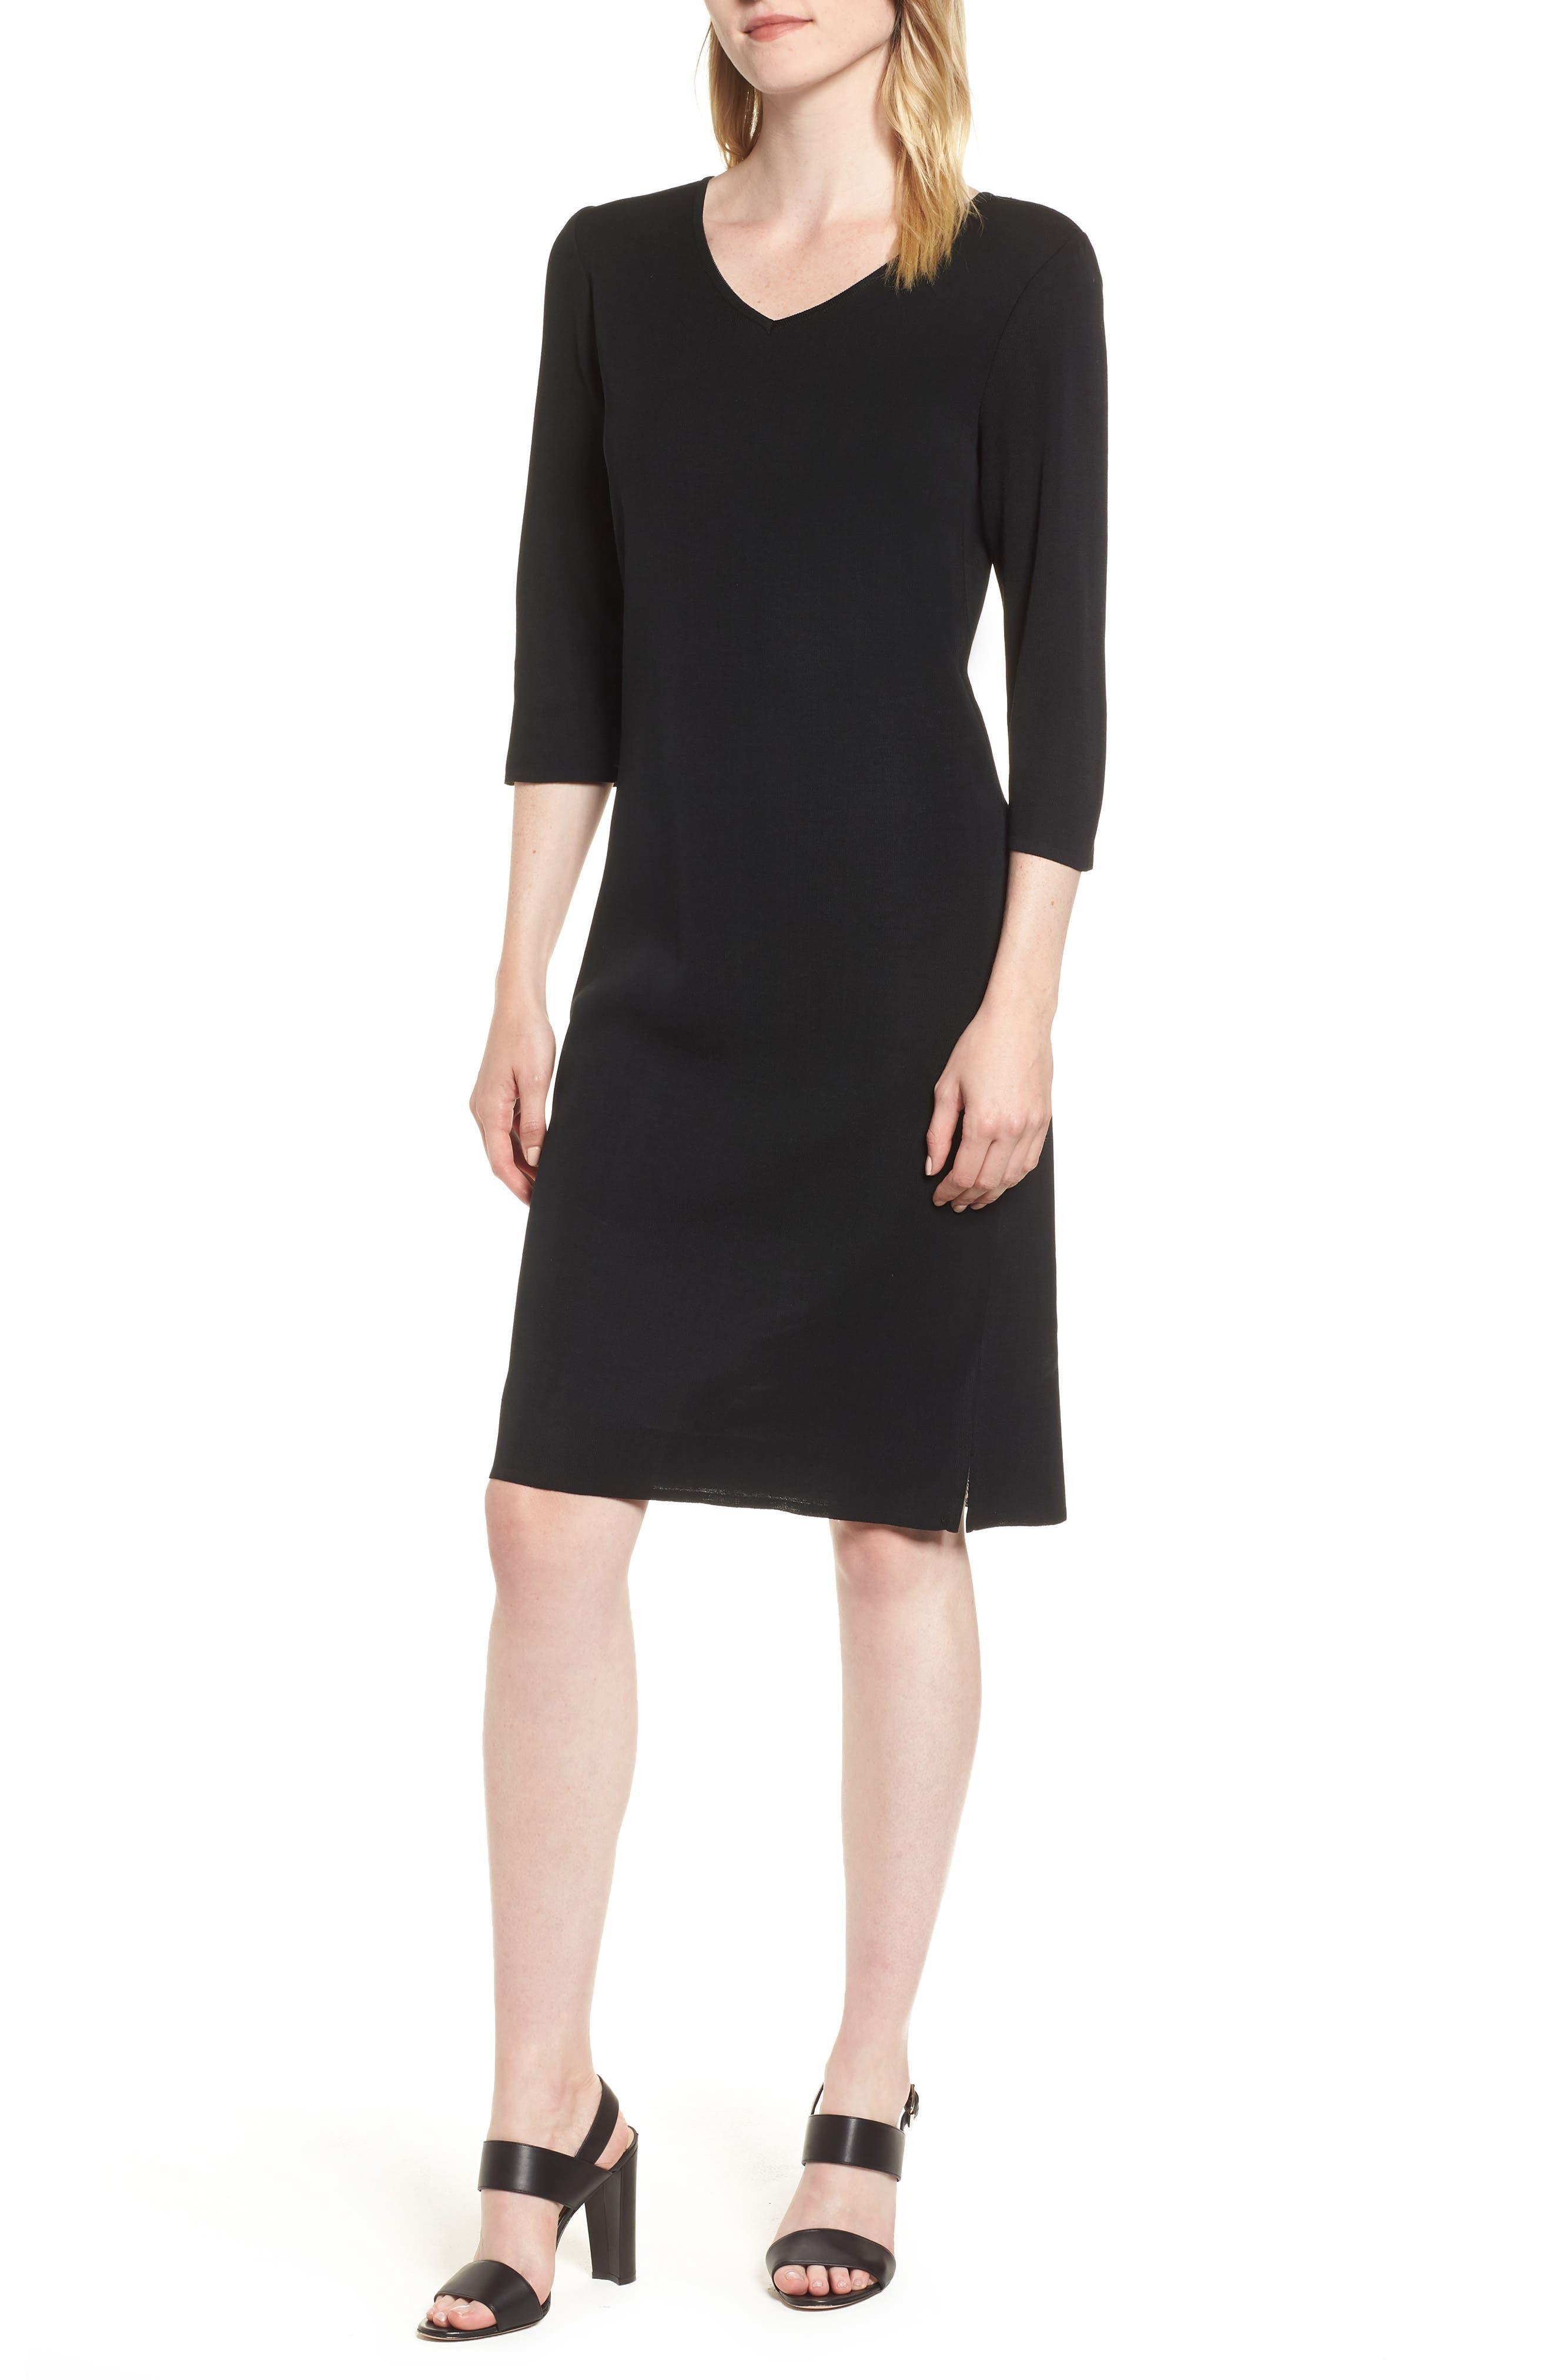 9aeed156ad6 Women s   Teens  Little Black Dresses